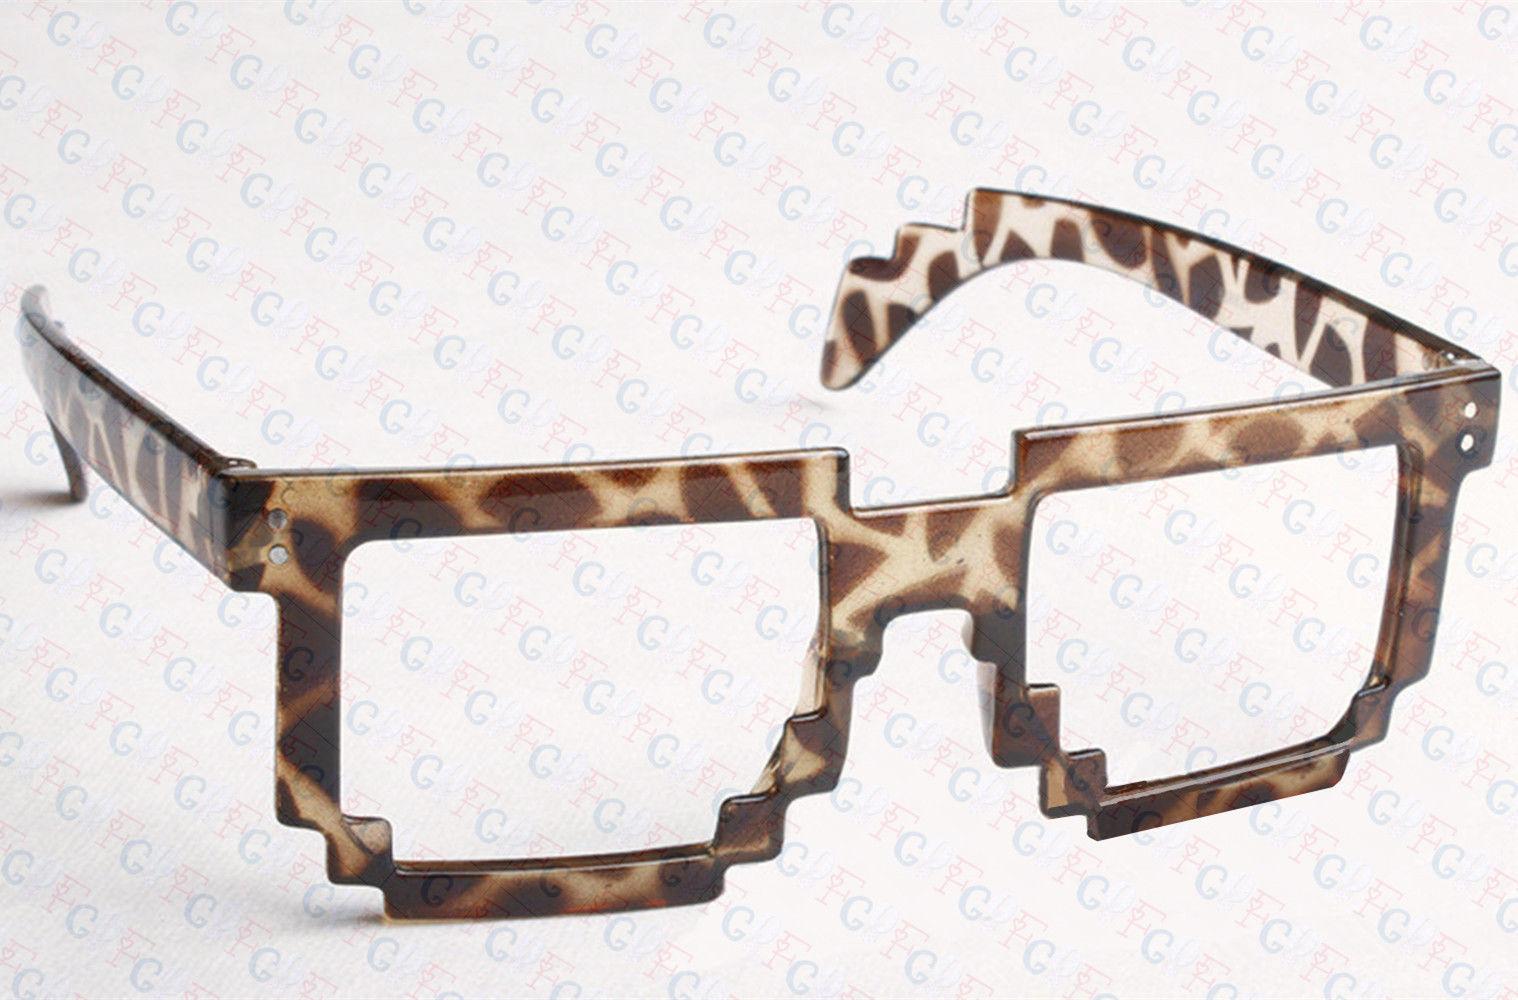 8 Bit Pixel Retro Pixelated Glasses Geek Nerd Computer Cartoon Party No Lenses